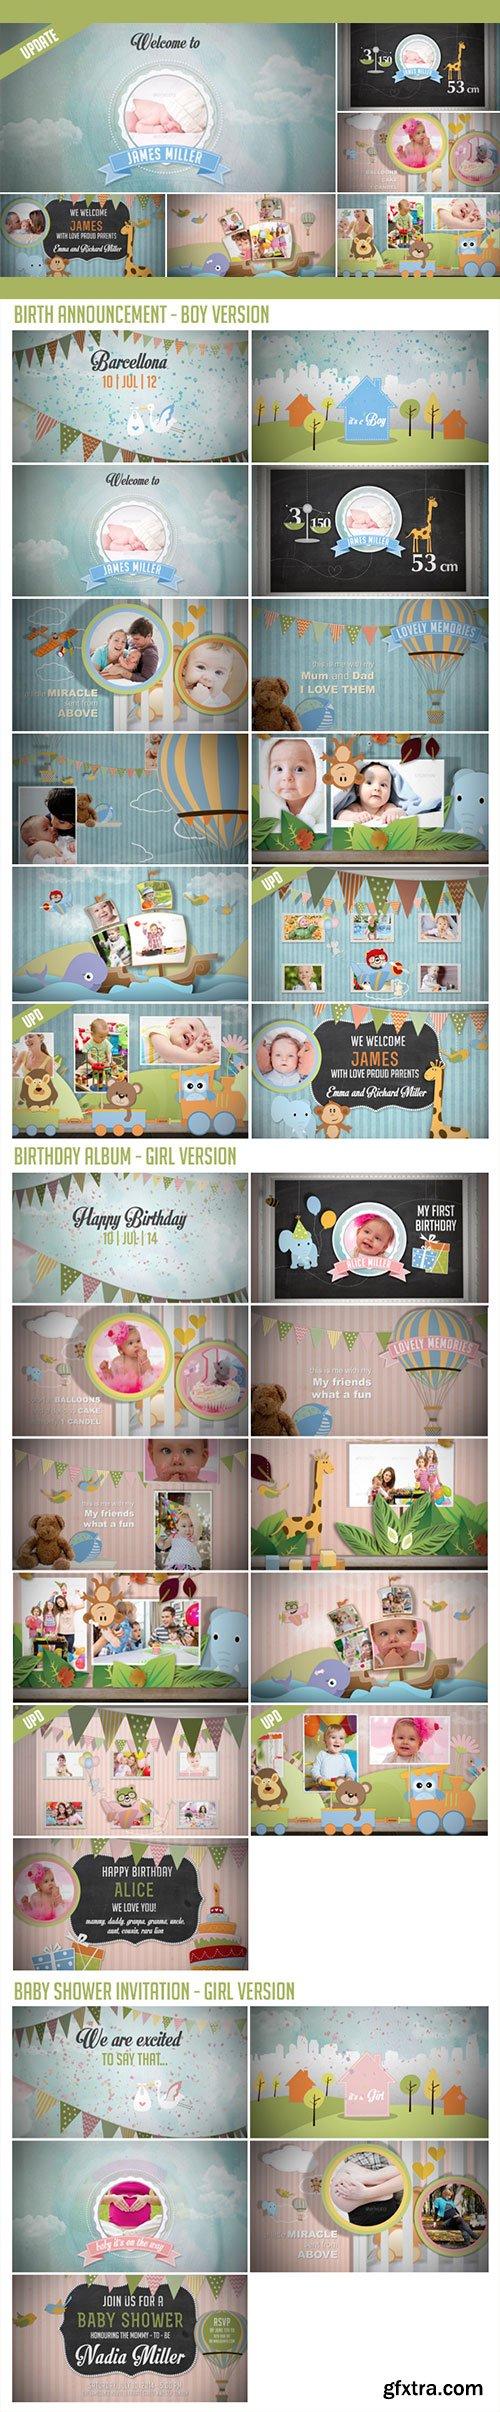 VideoHive - Birth Announcement - Baby Photo Album